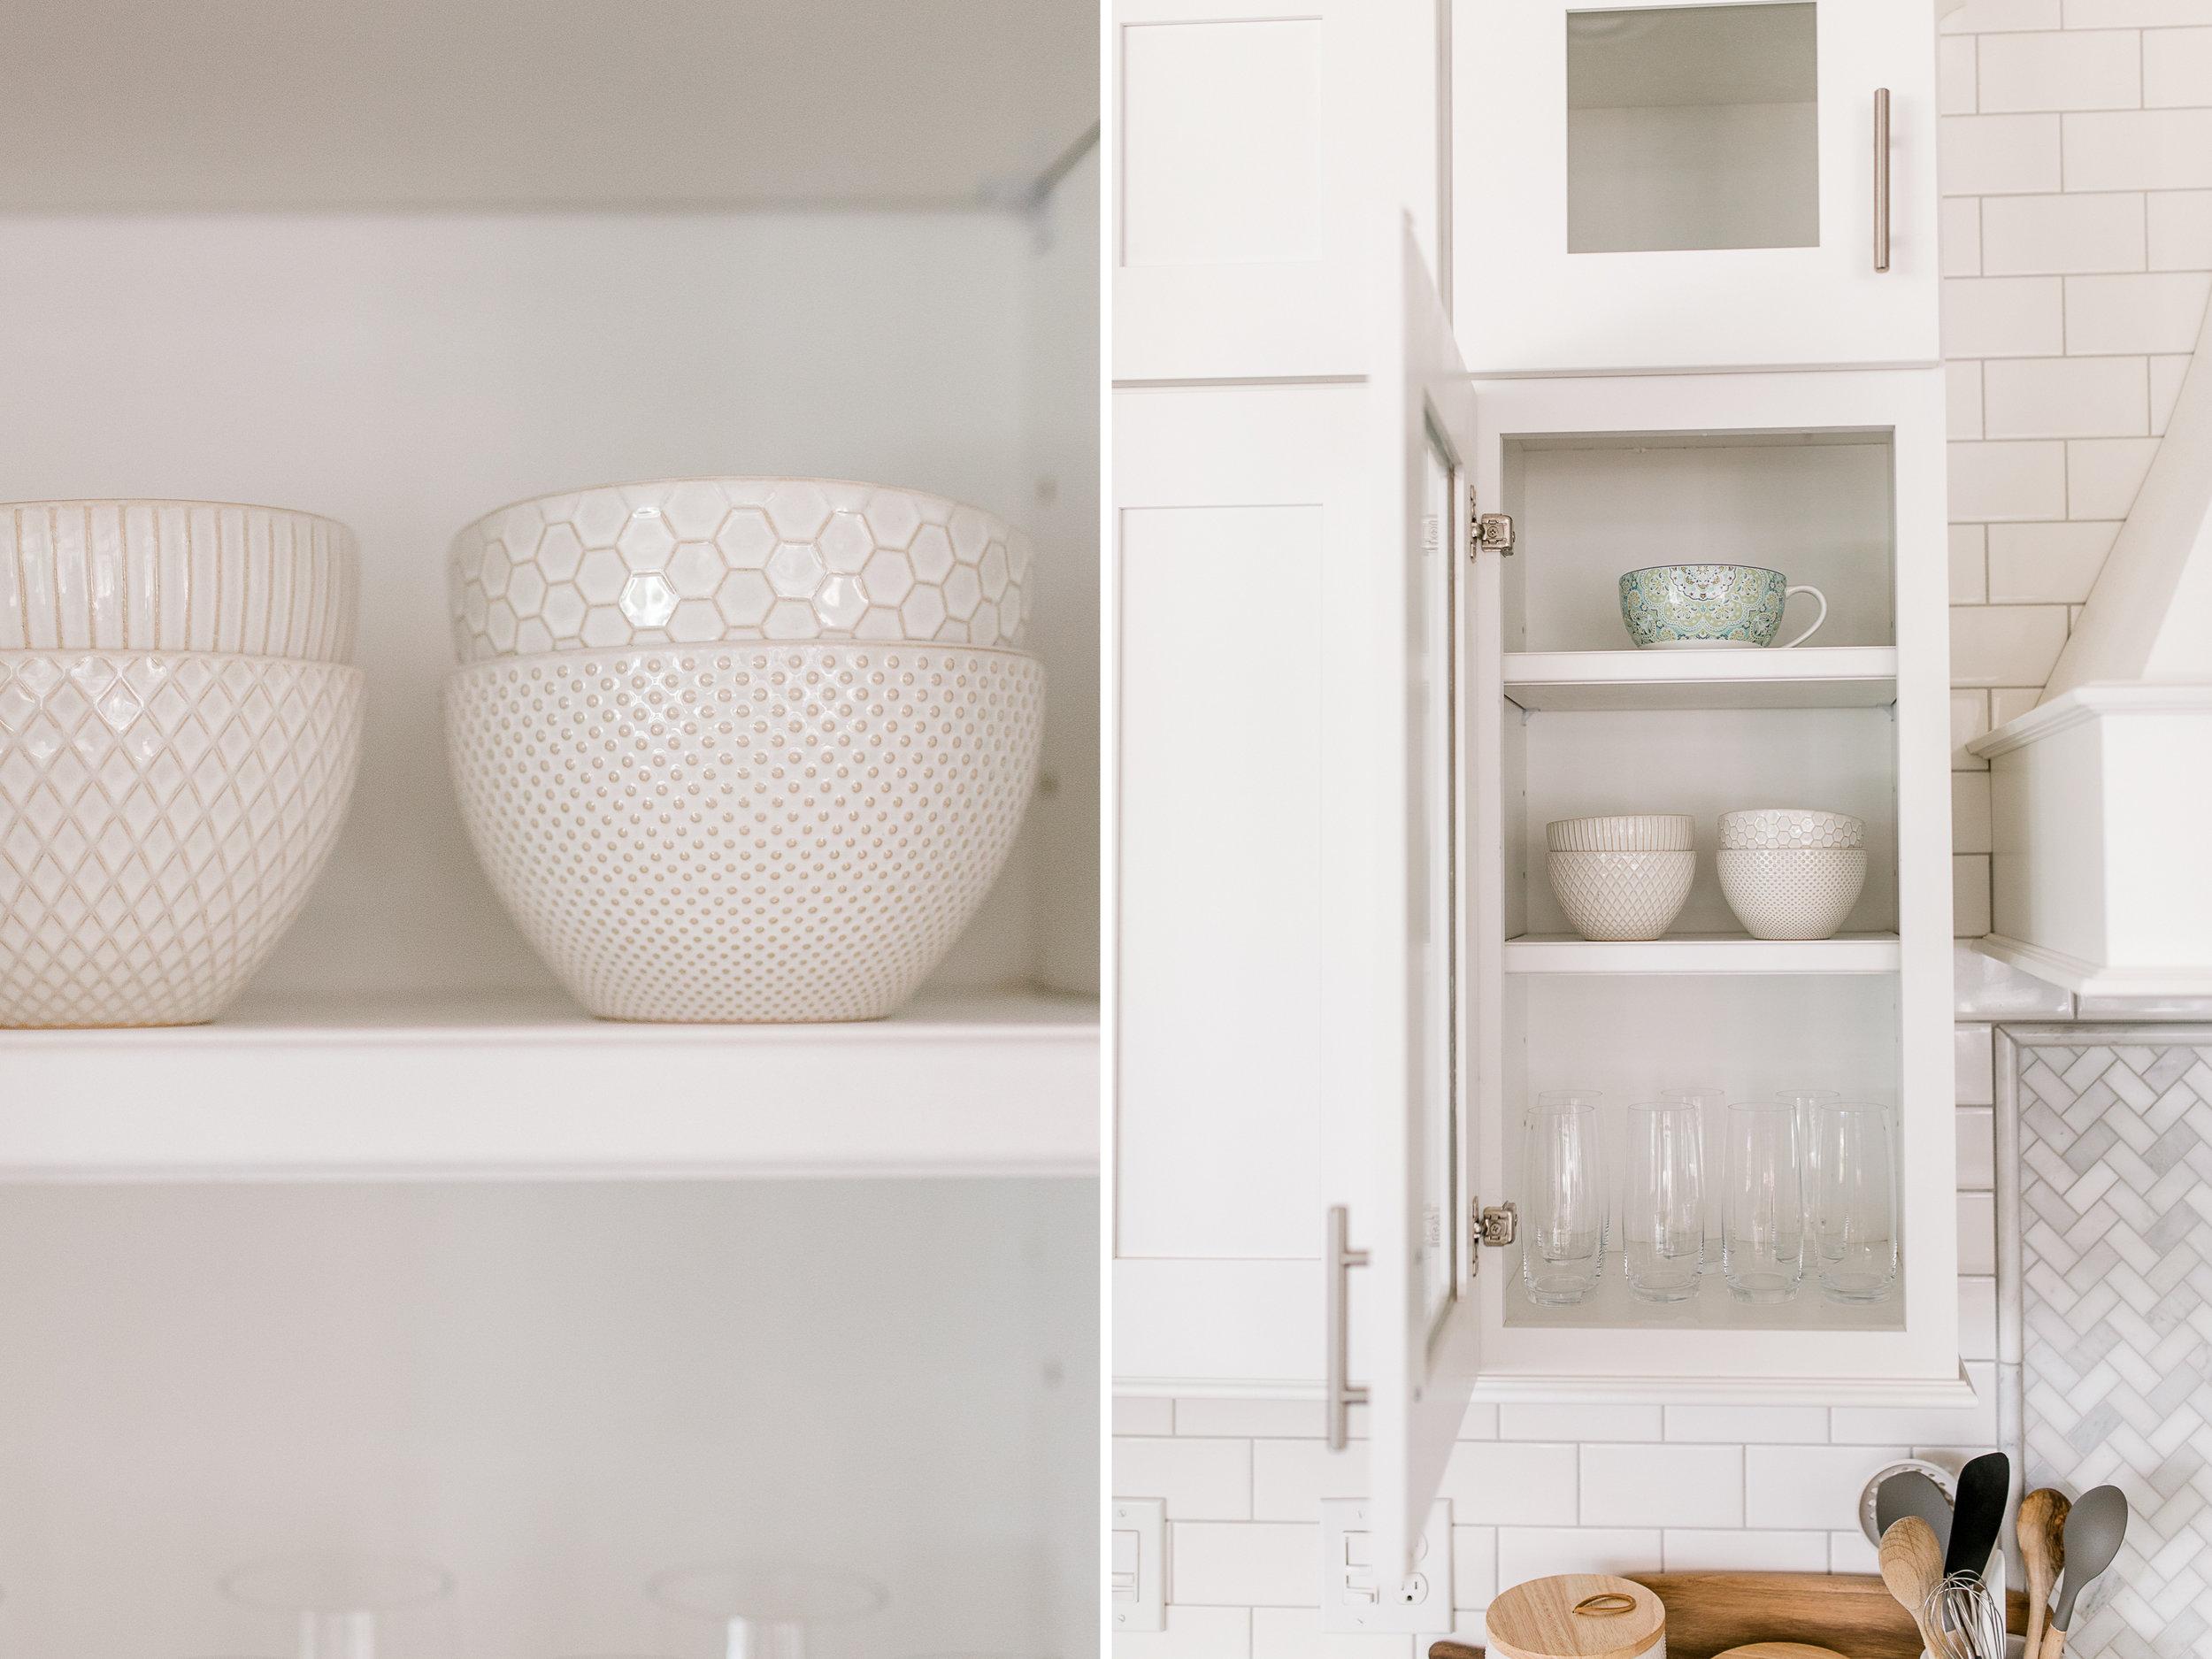 My White Modern Farmhouse Dream Kitchen | Industrial Kitchen | Fixer Upper Style Kitchen | Gray & White Kitchen | Apron Sink & Subway Tile